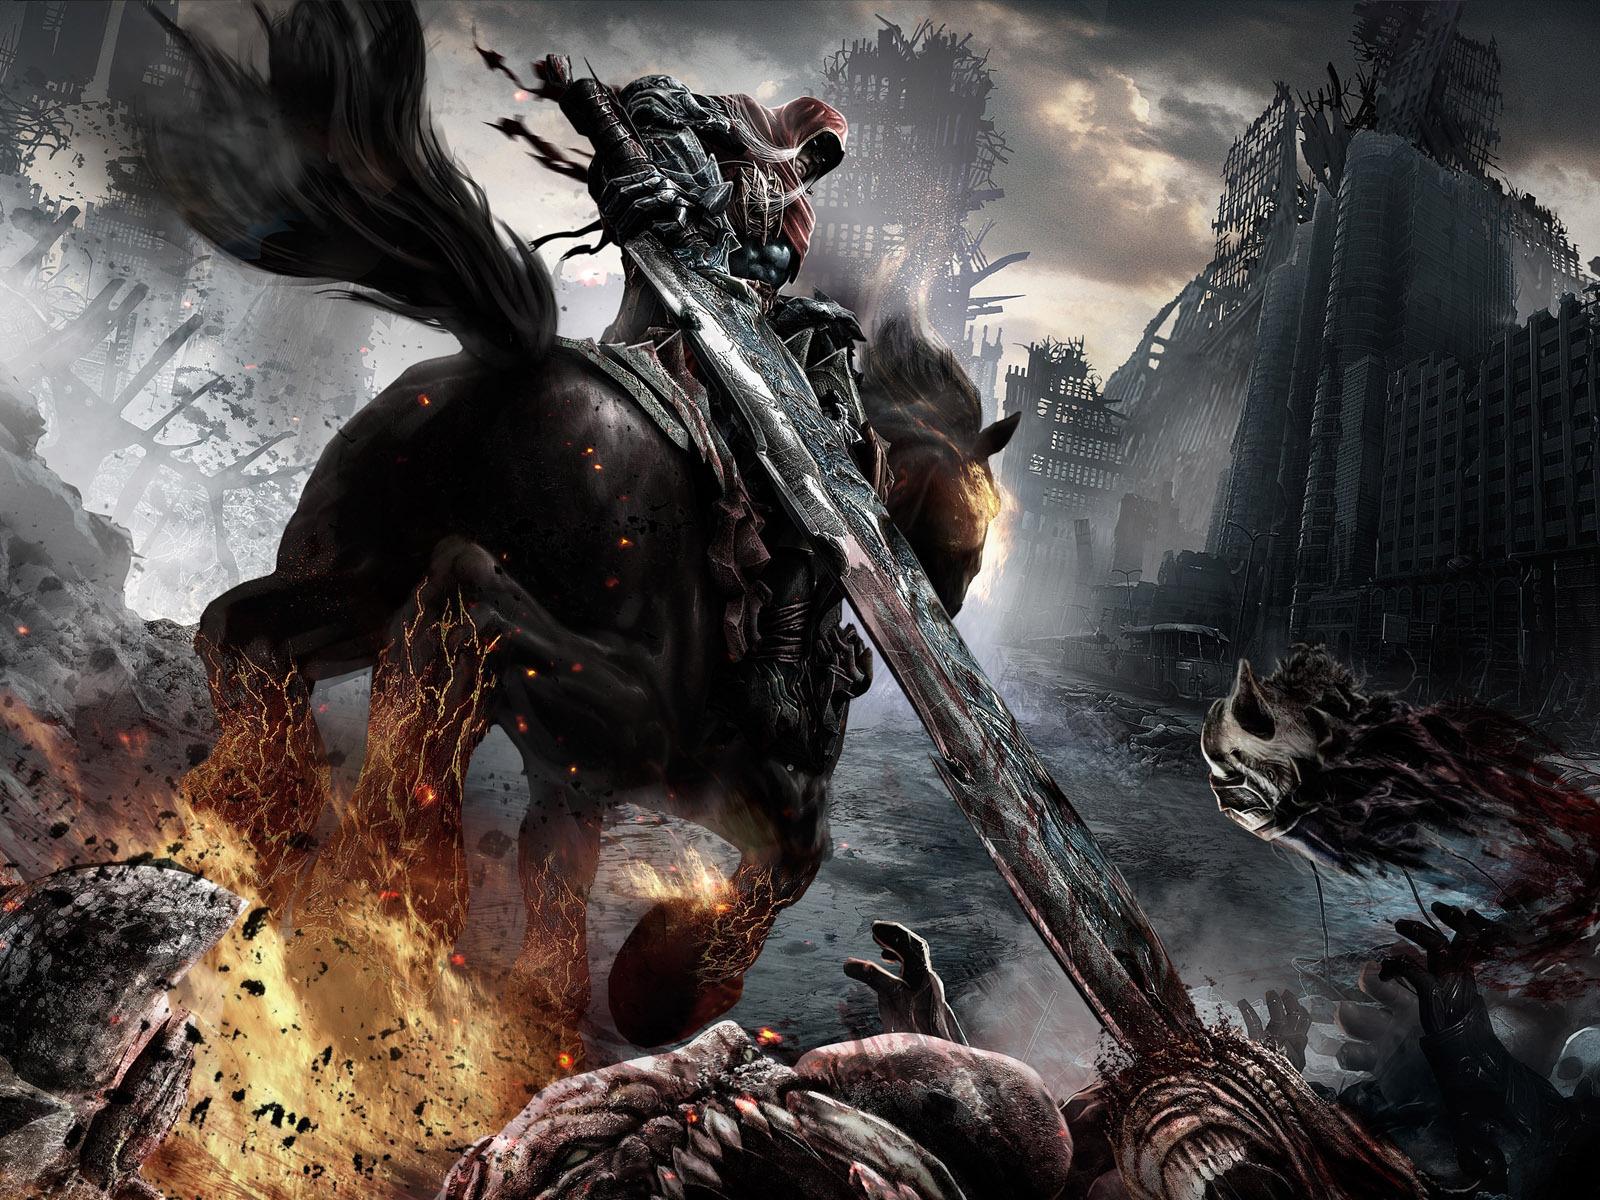 Hero On The Battlefield Final Fantasy Xv Desktop Wallpapers 1600x1200